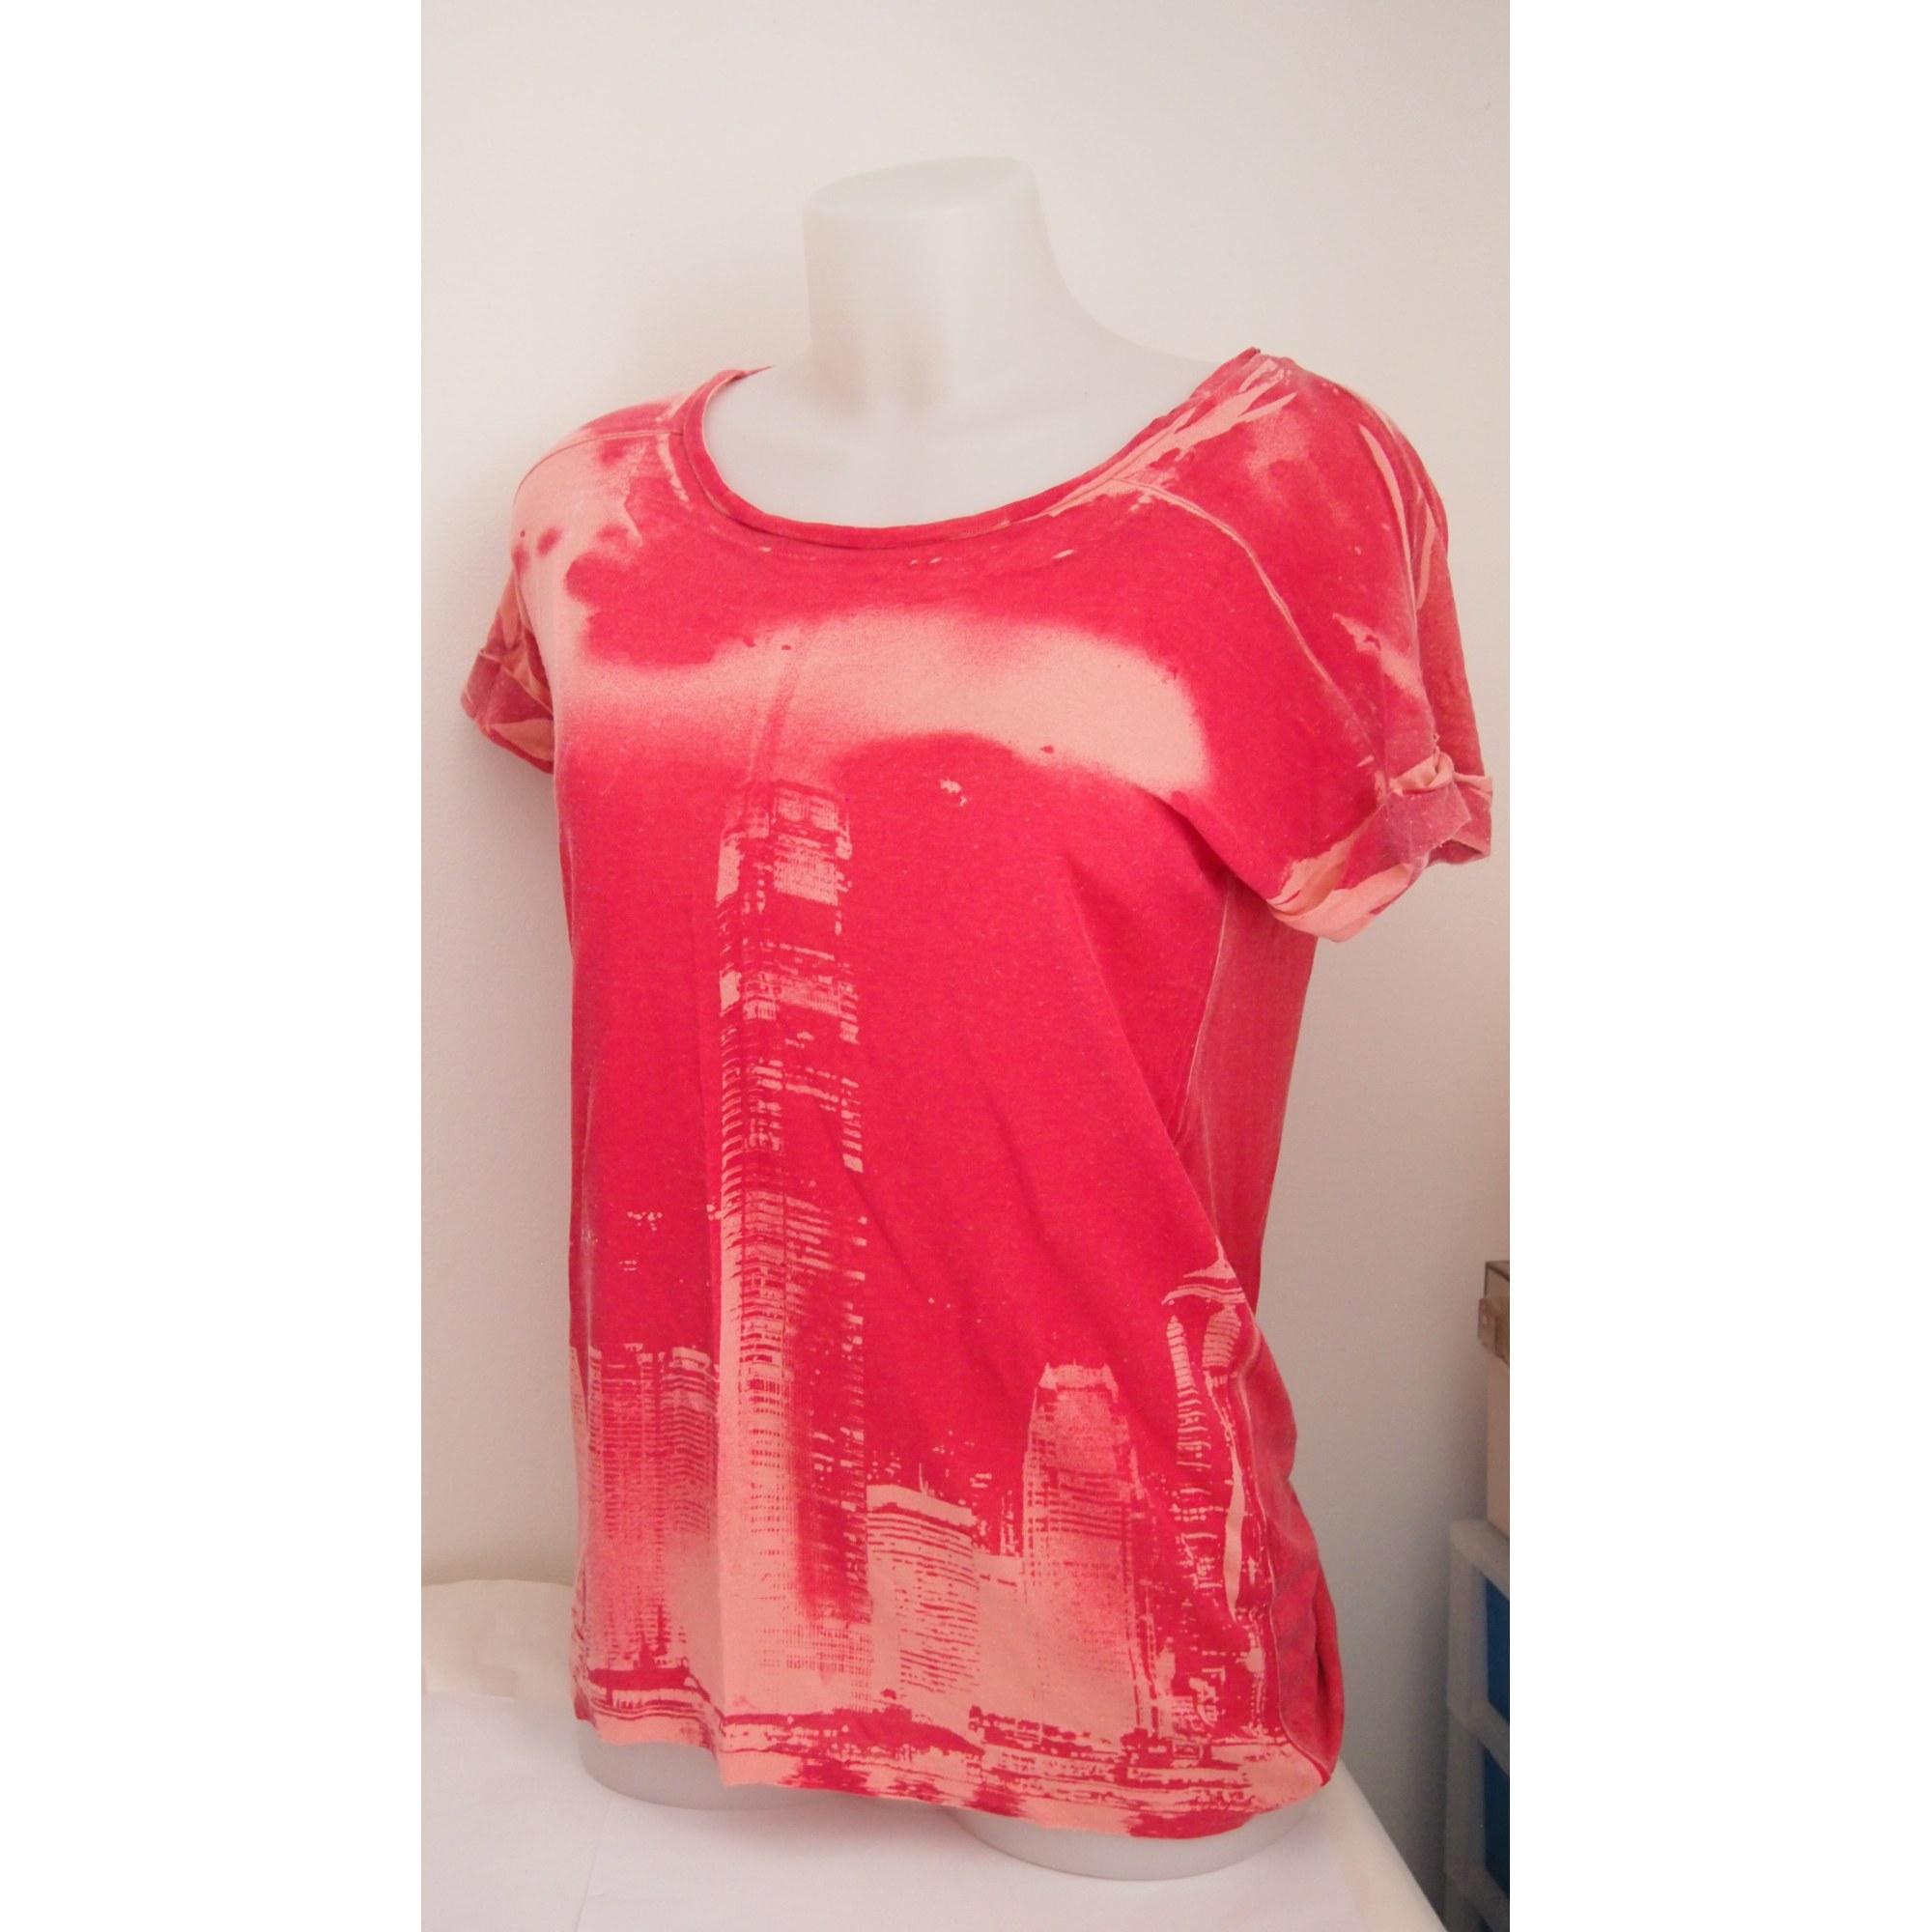 Top, tee-shirt ONLY Rose, fuschia, vieux rose